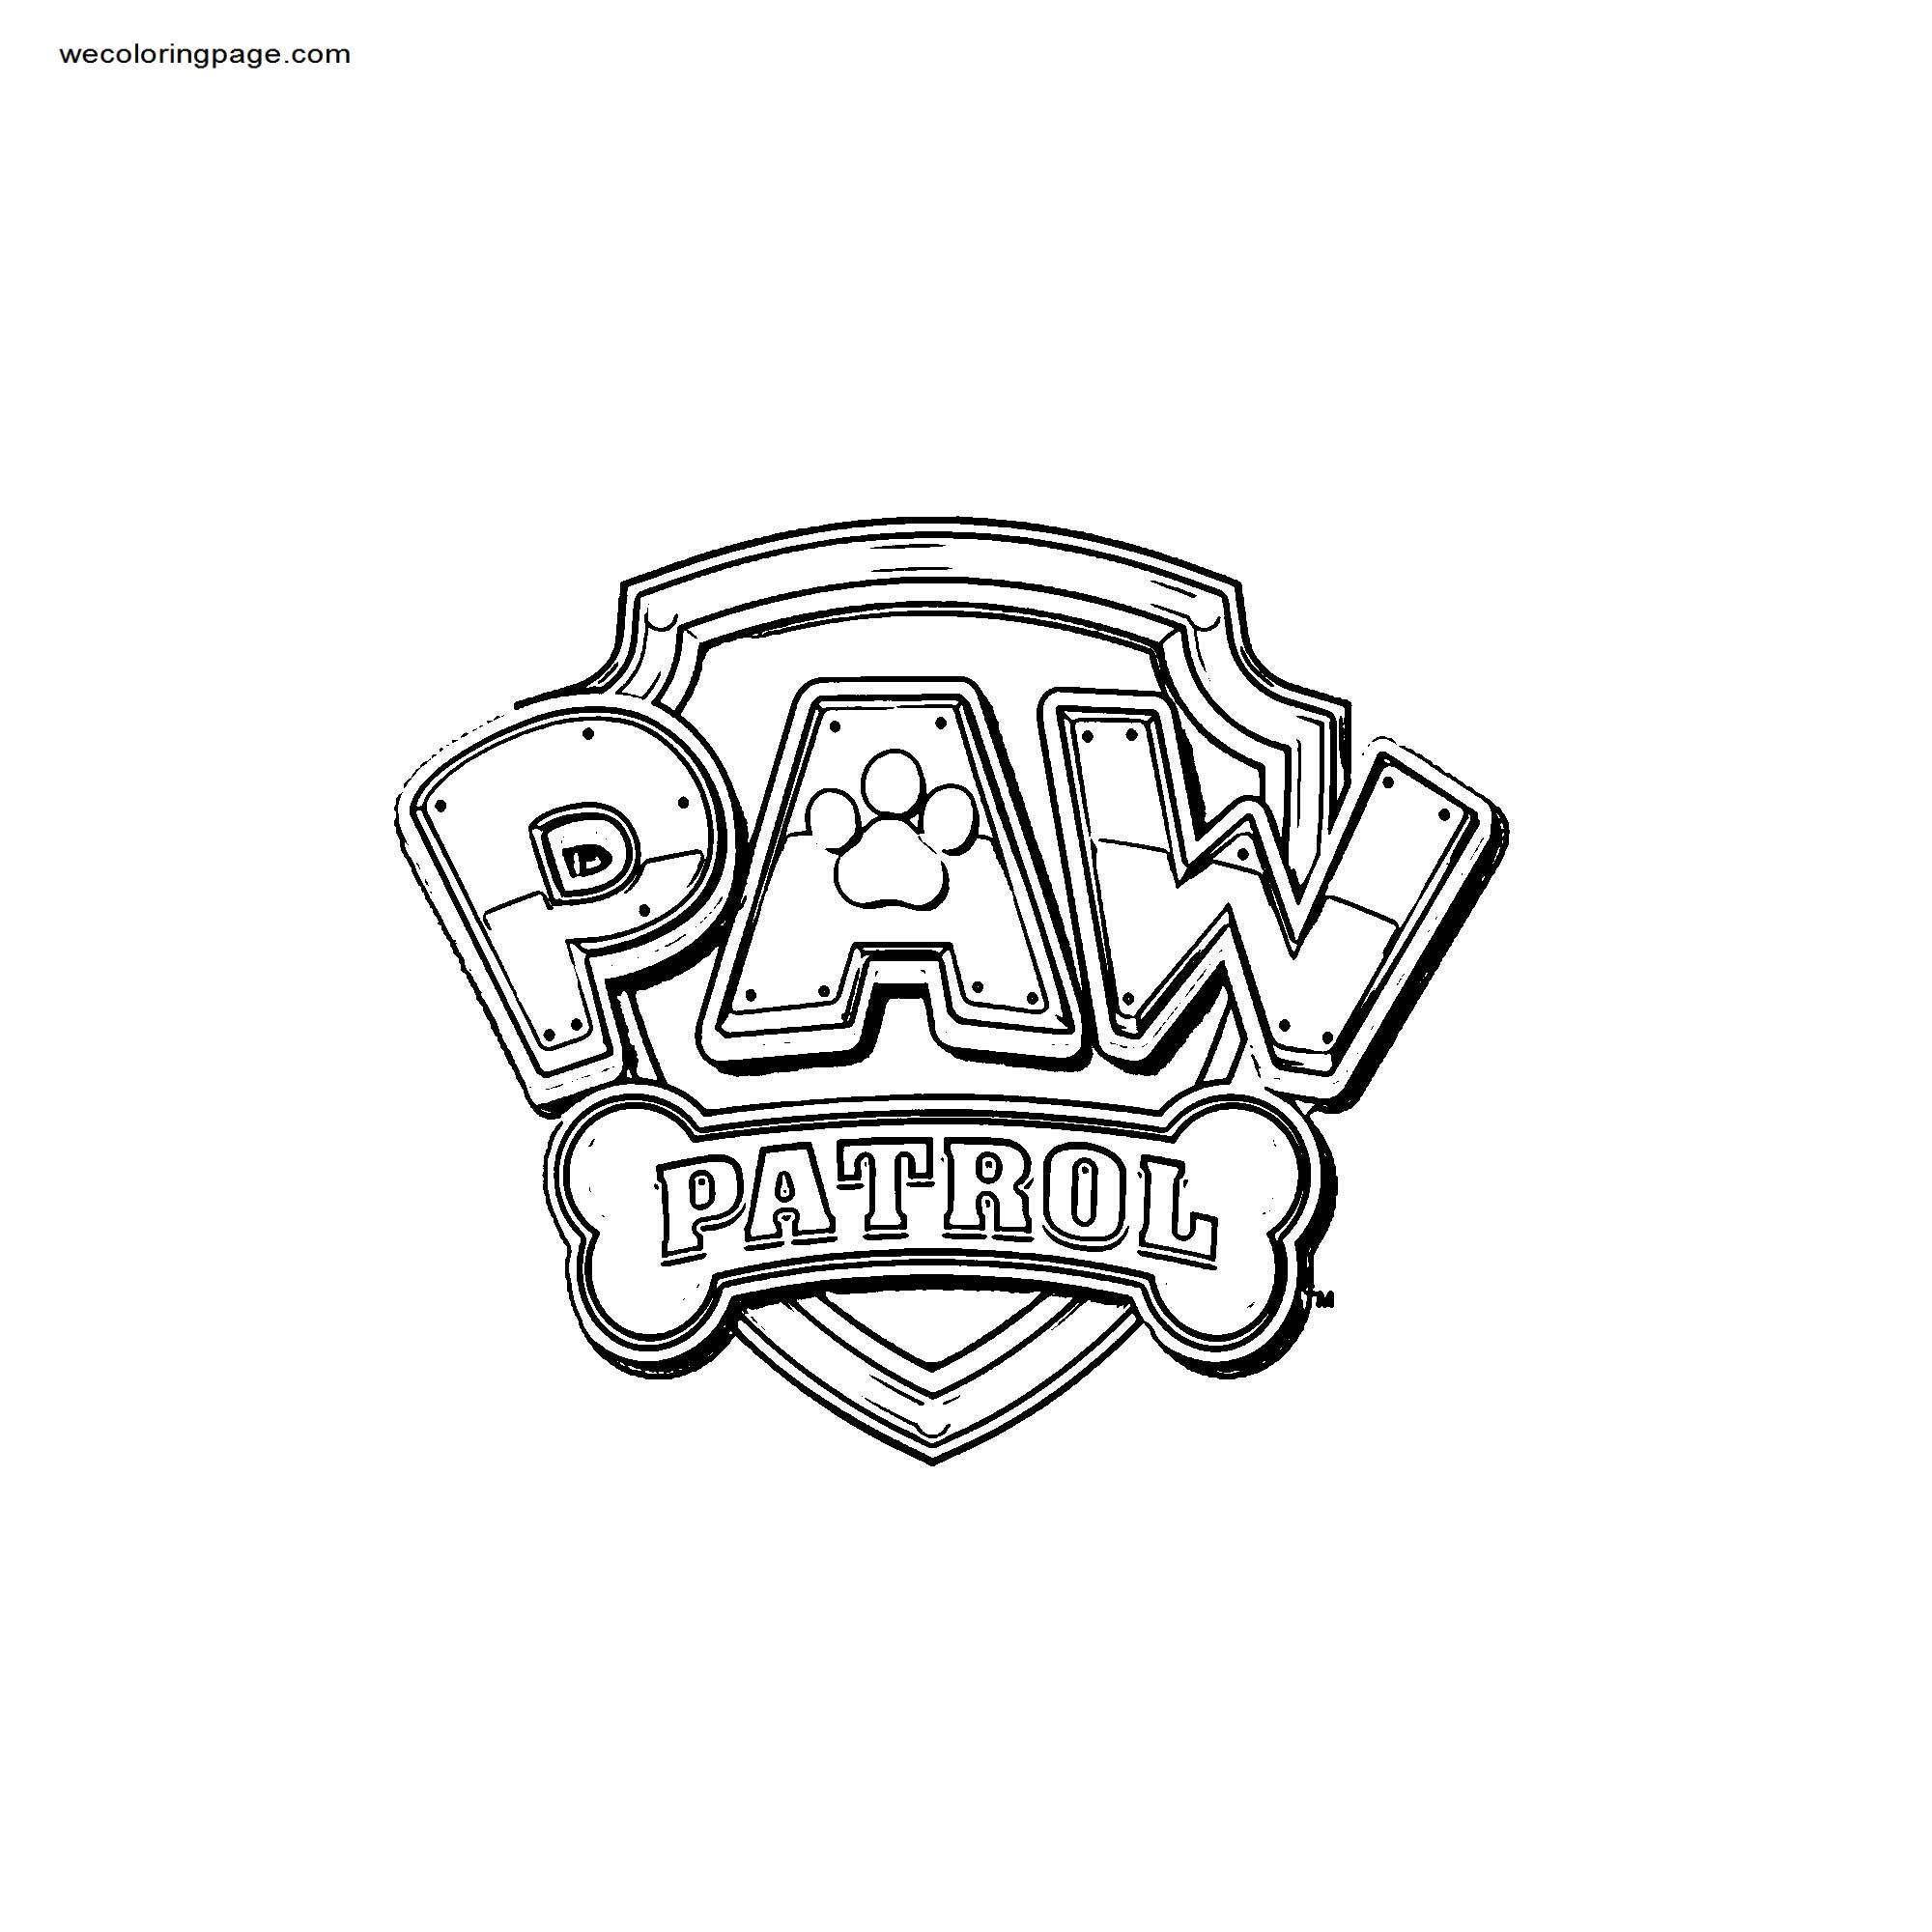 Pawpatrollogo Small Coloring Page